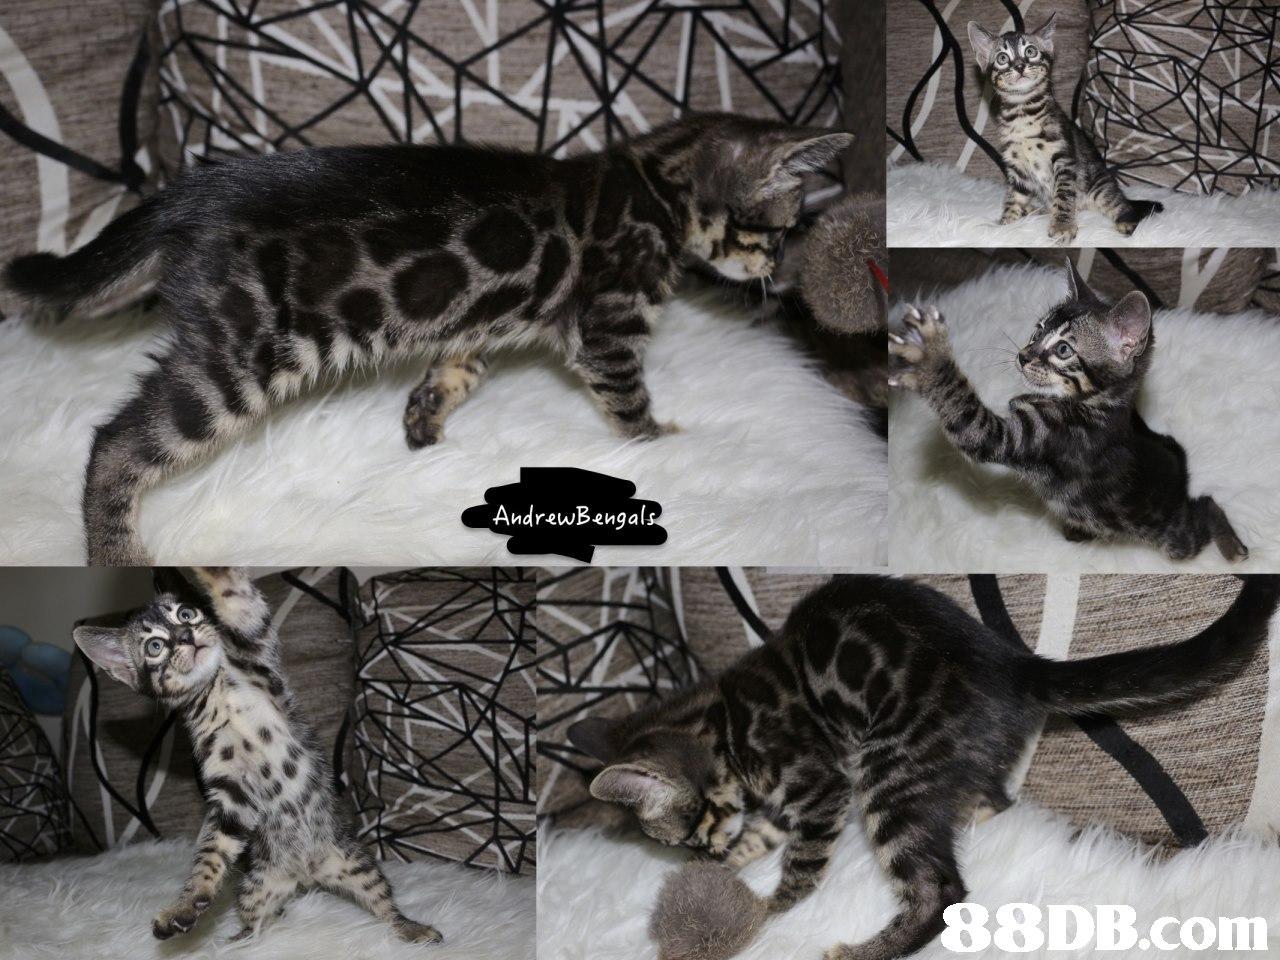 AndrewBangal 8DB.com,cat,mammal,small to medium sized cats,cat like mammal,fauna